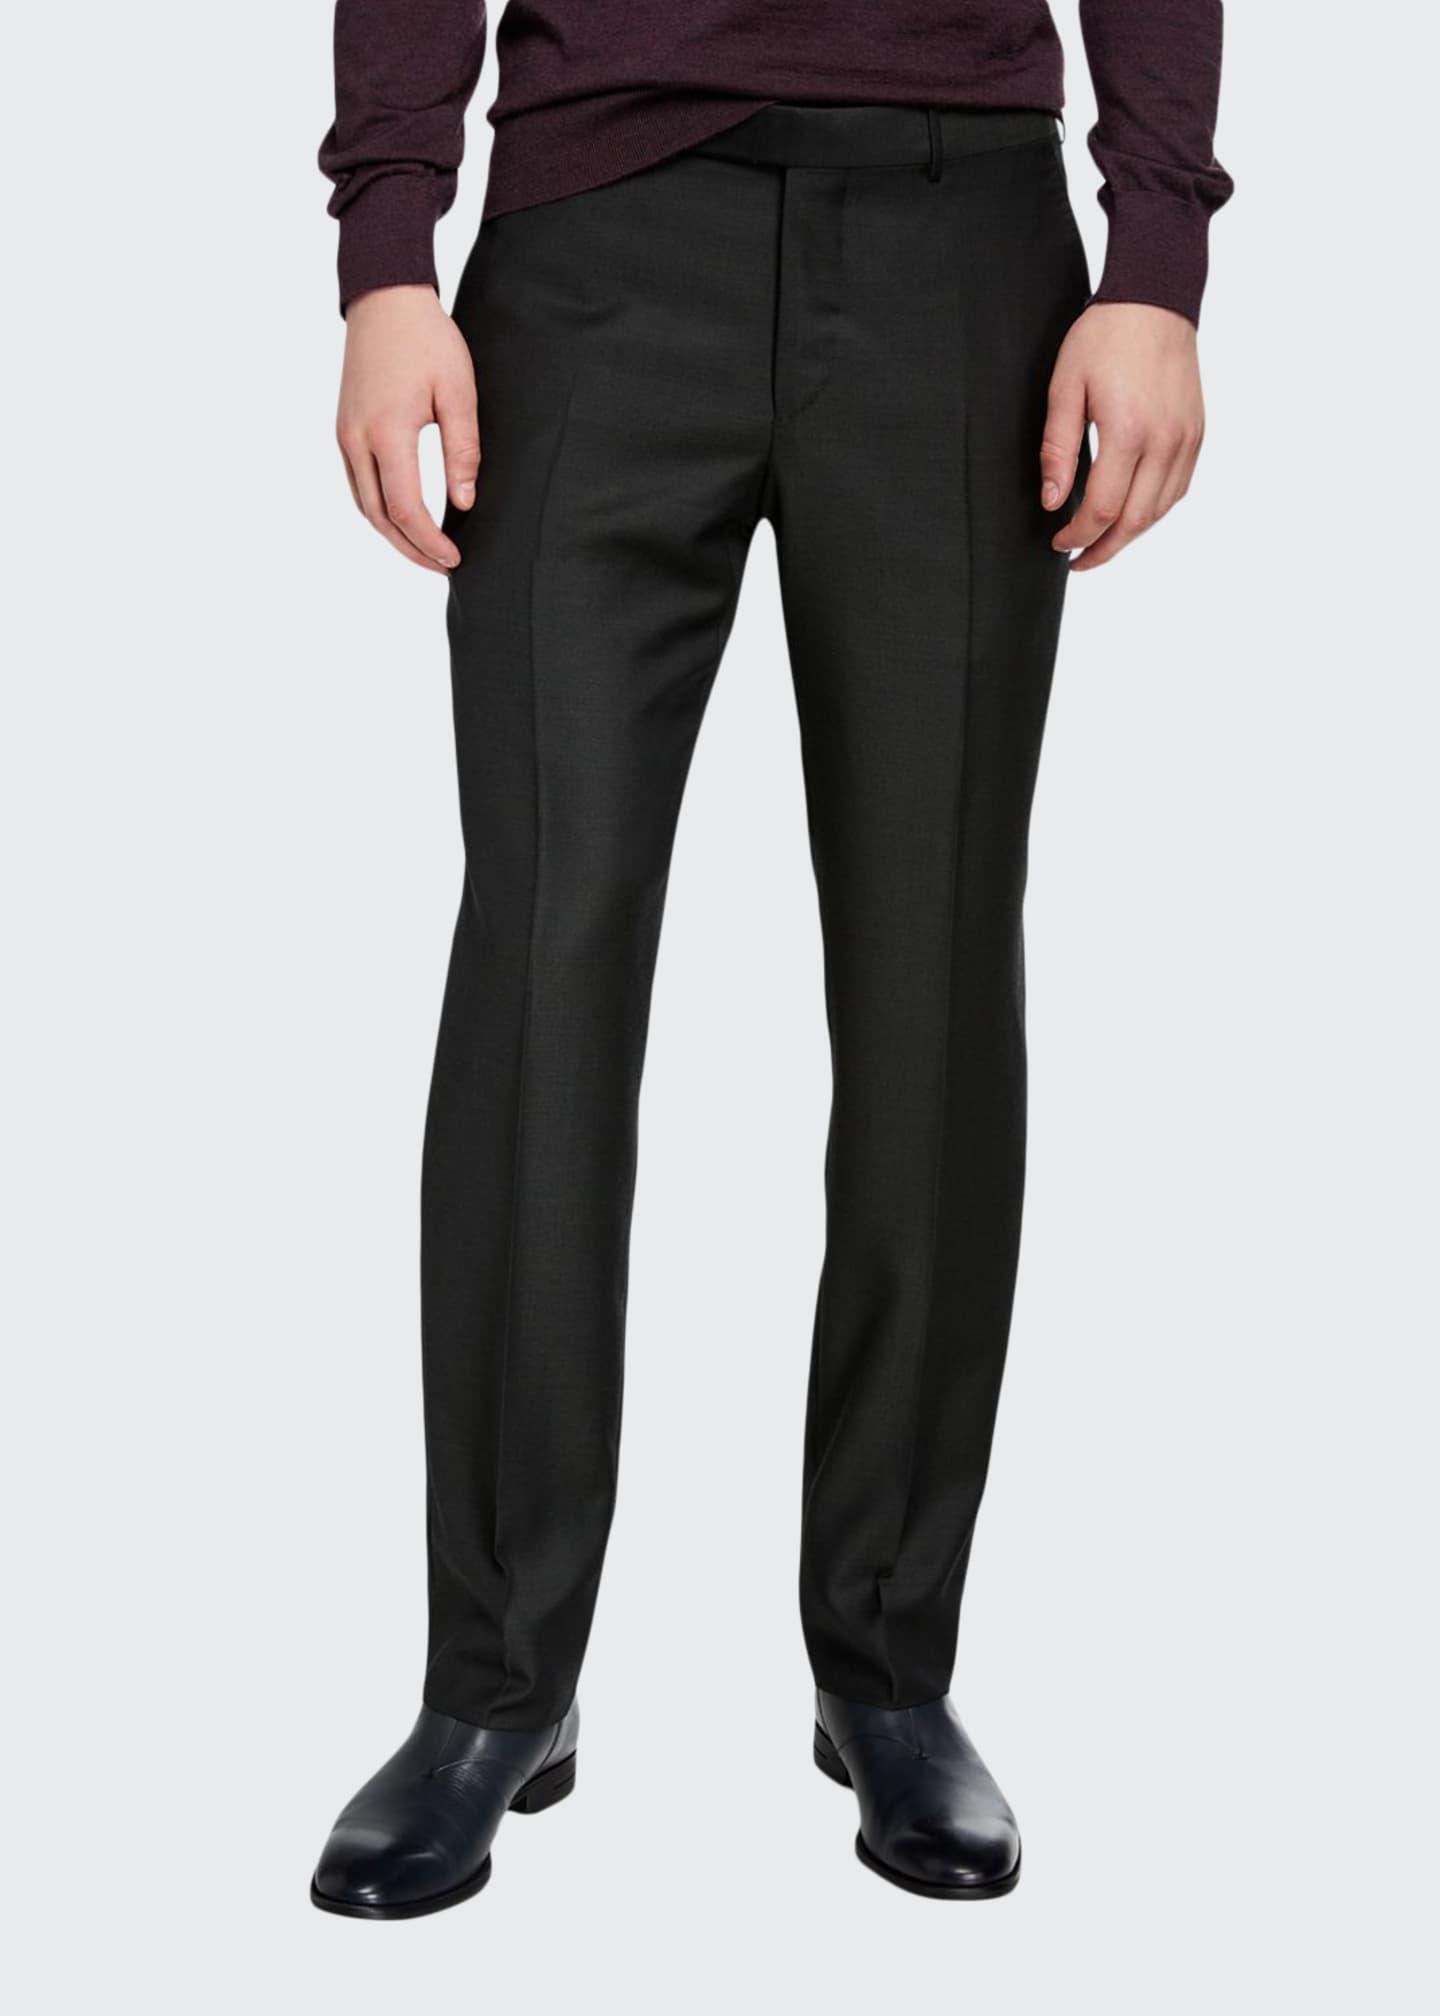 Ermenegildo Zegna Men's Loden Achill Twill Trousers